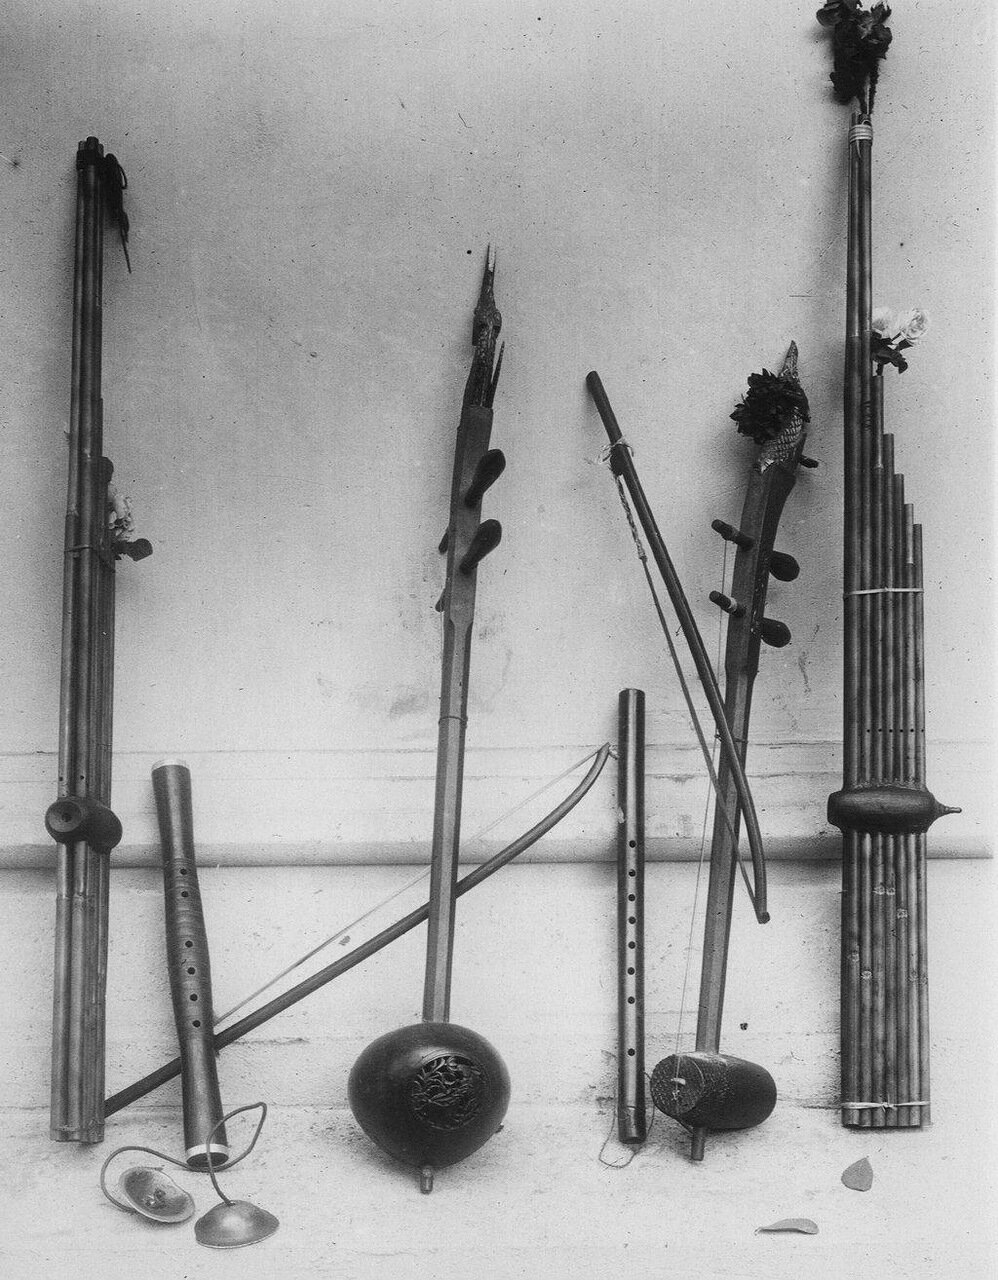 Лаос. Инструменты лаосской музыки. Хен, две флейты, тарелки Синг